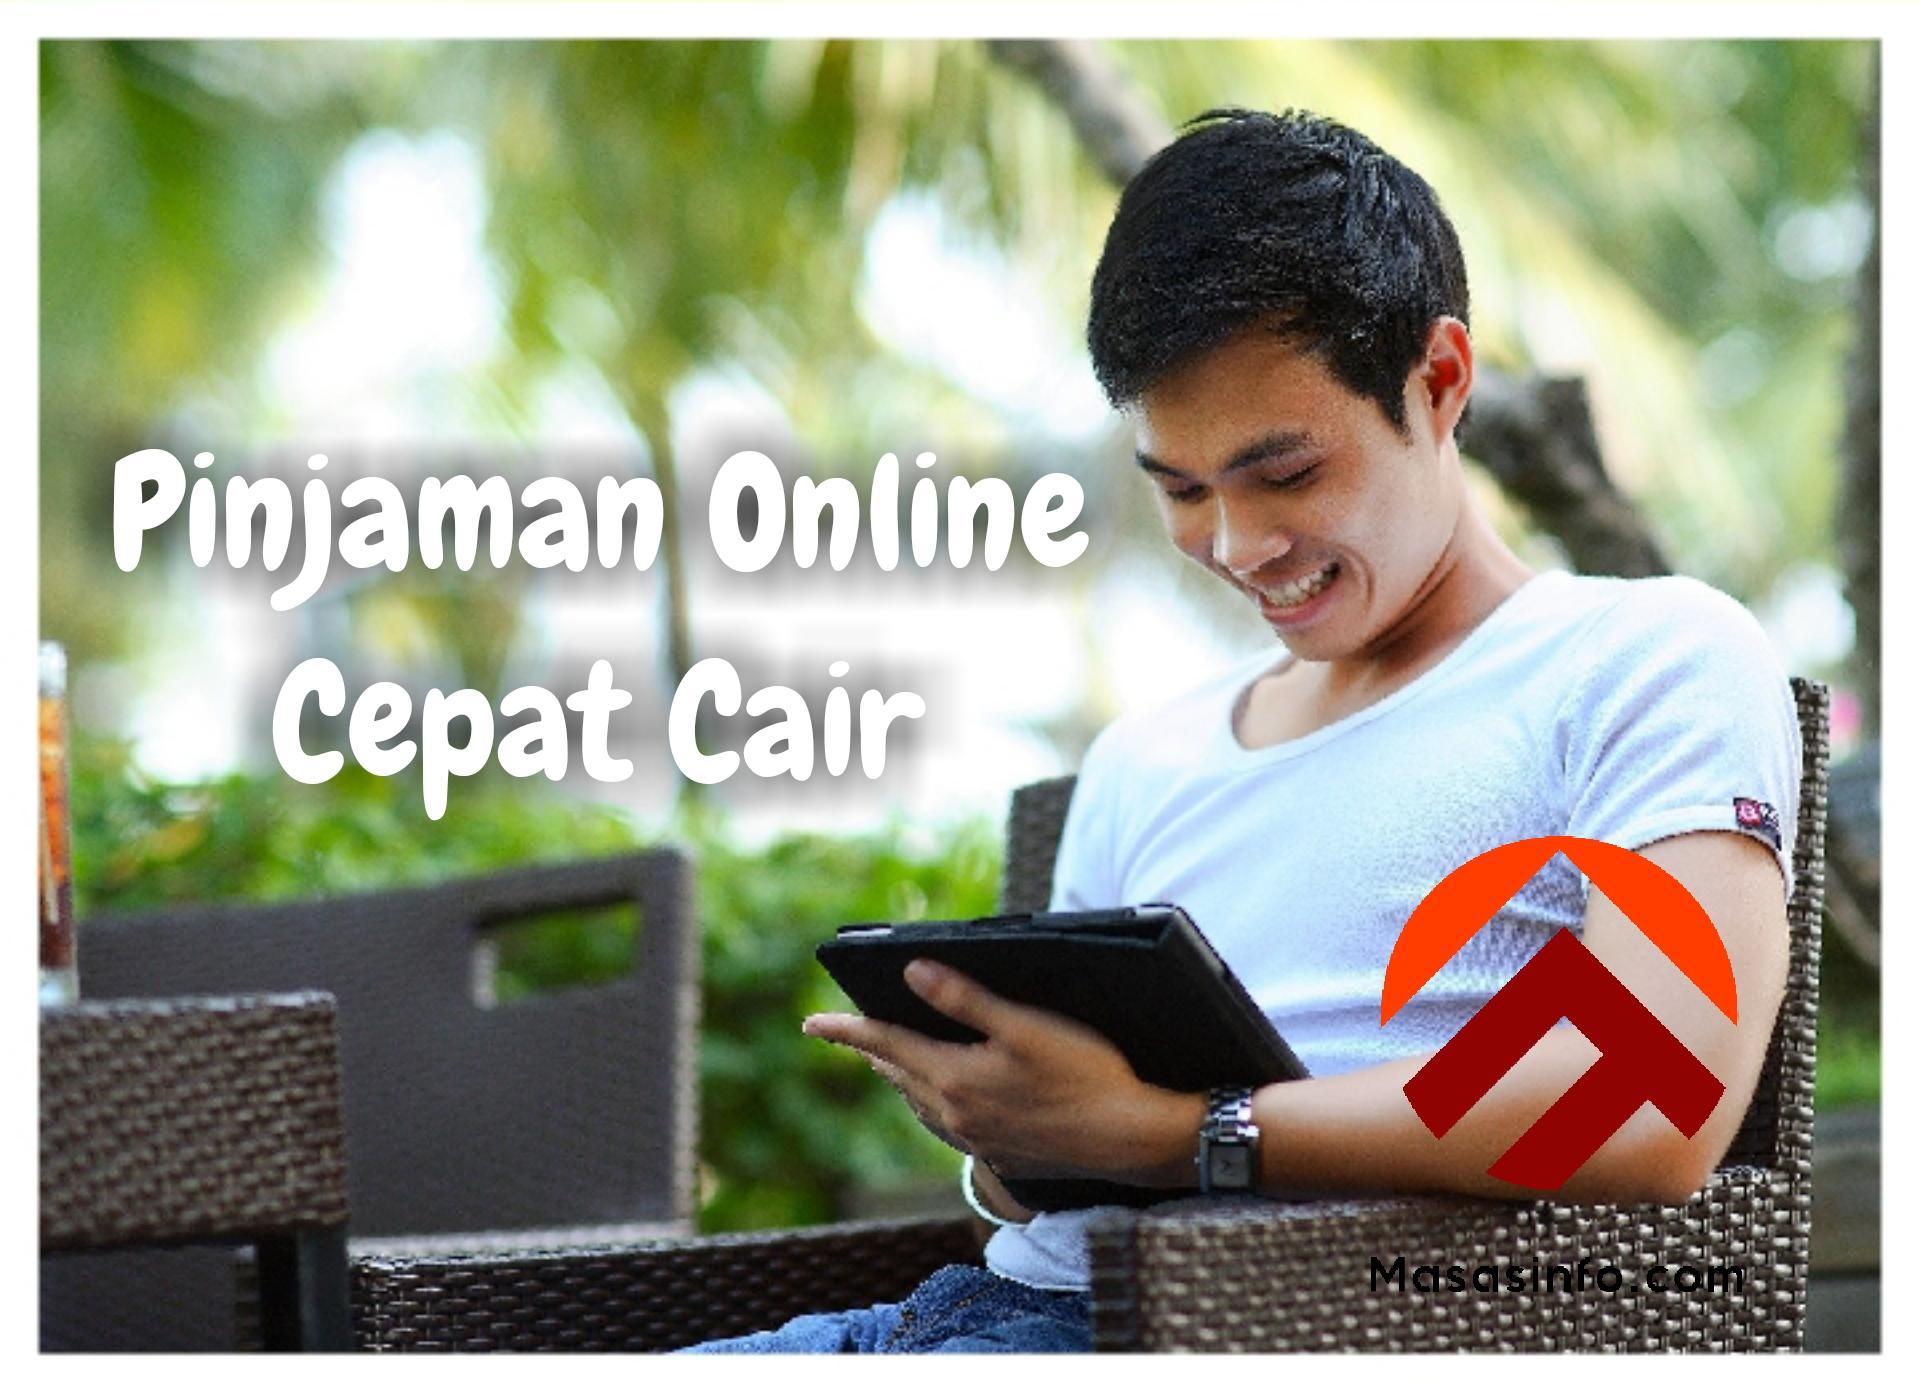 Pinjaman Online Cepar Cair